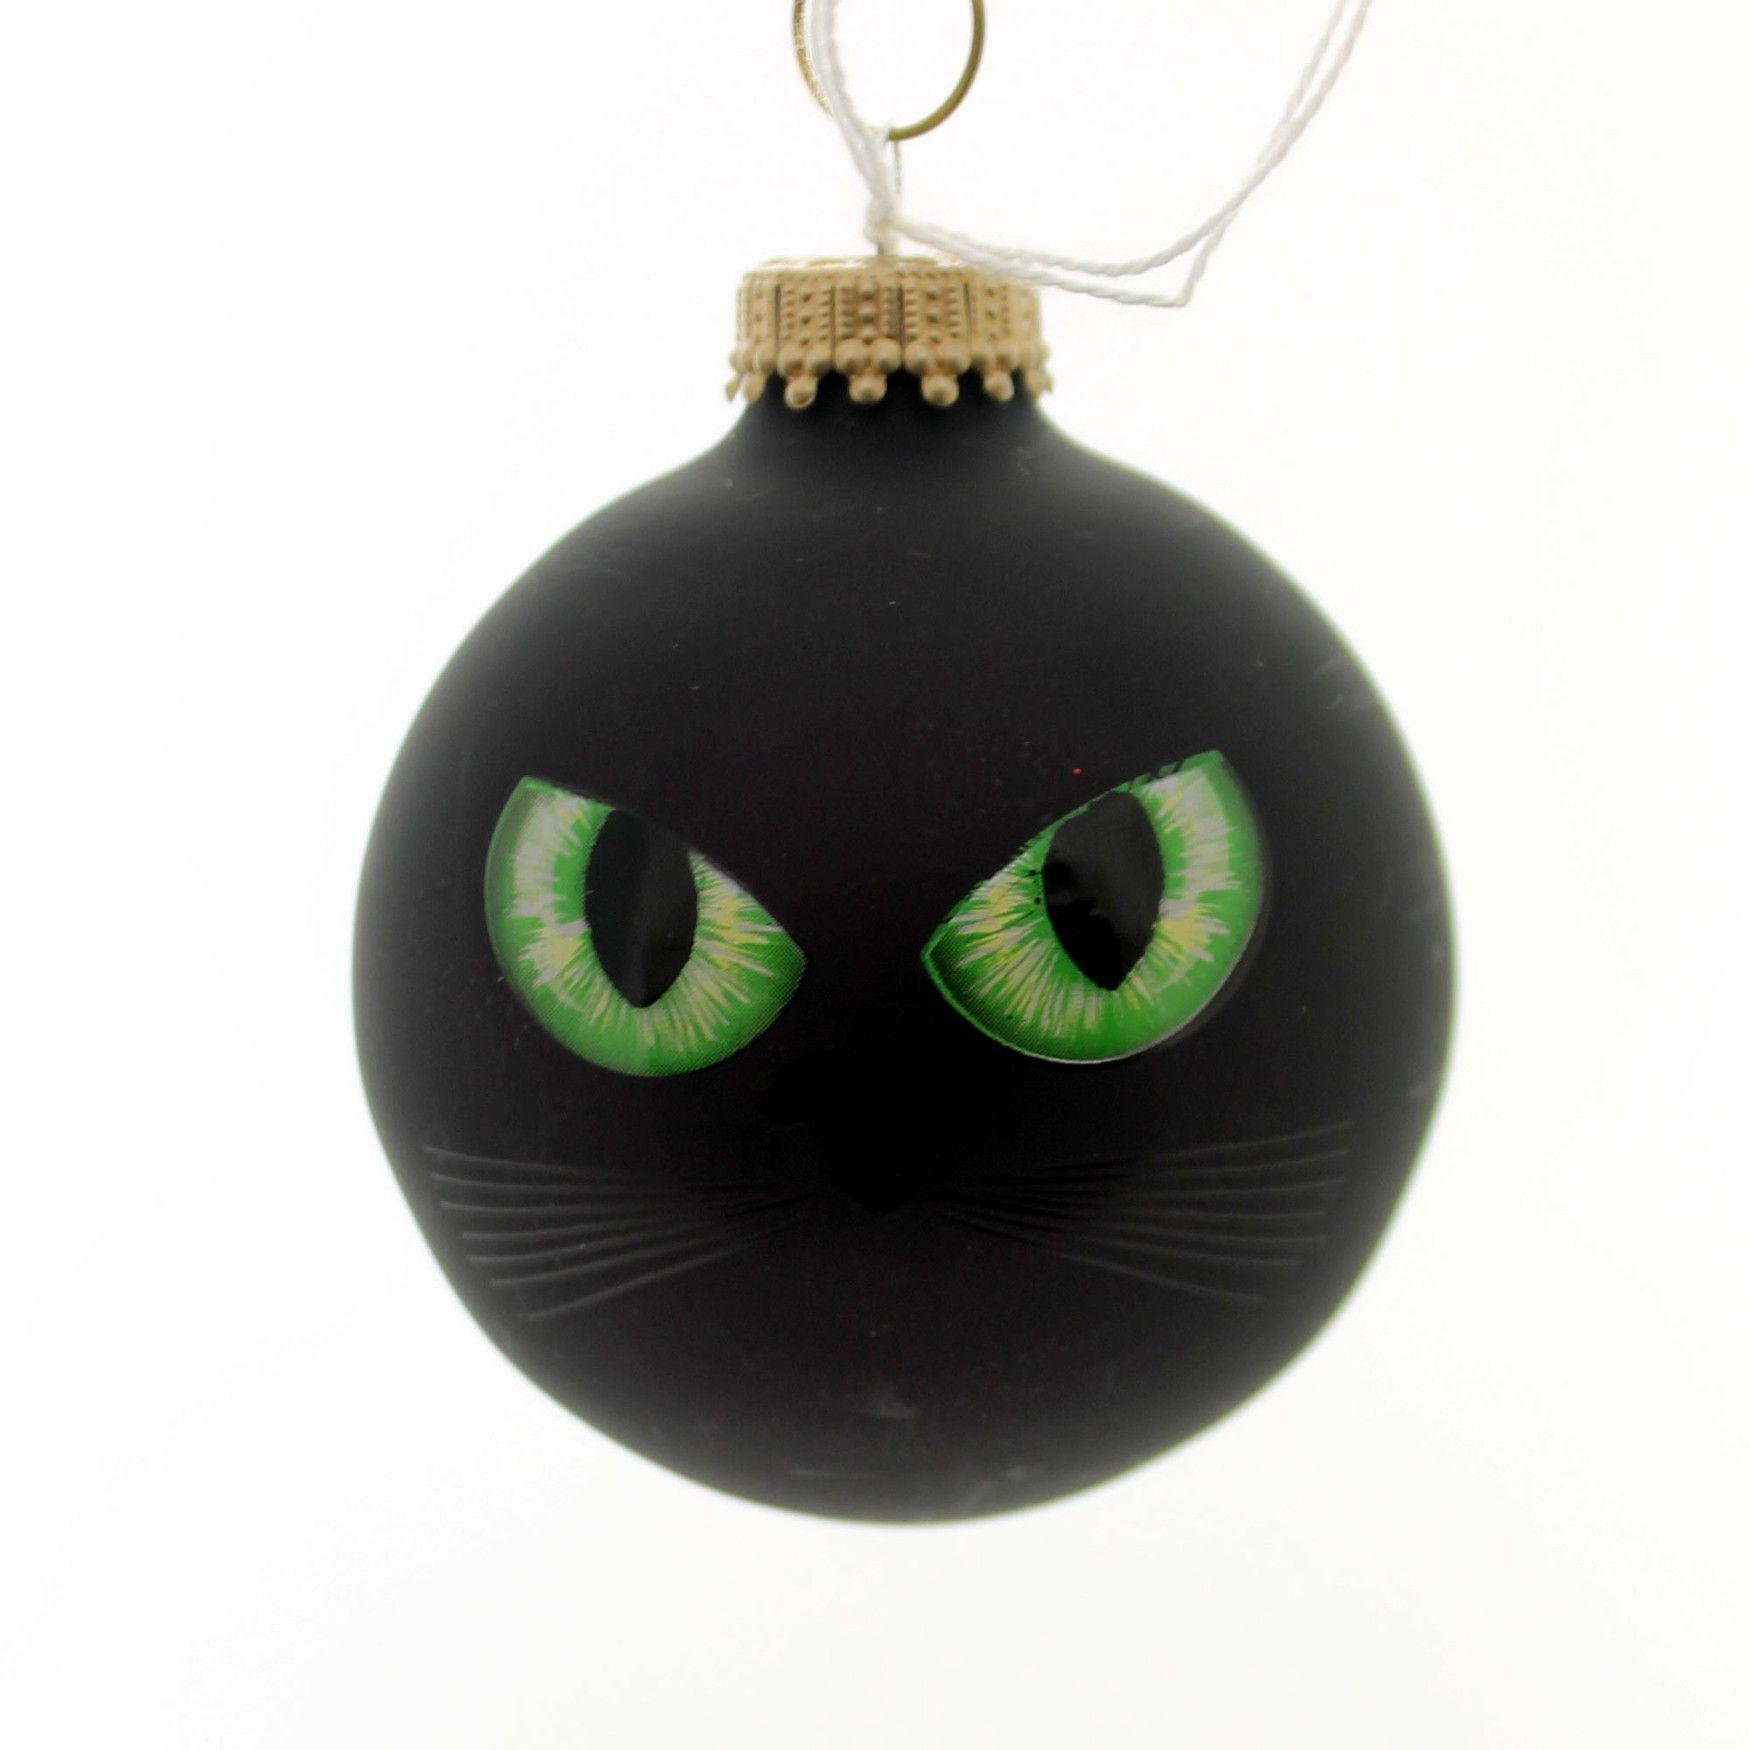 Christmas Tree Made Of Black Cats: Holiday Ornaments HALLOWEEN CAT EYES/EYEBALL Glass Spooky